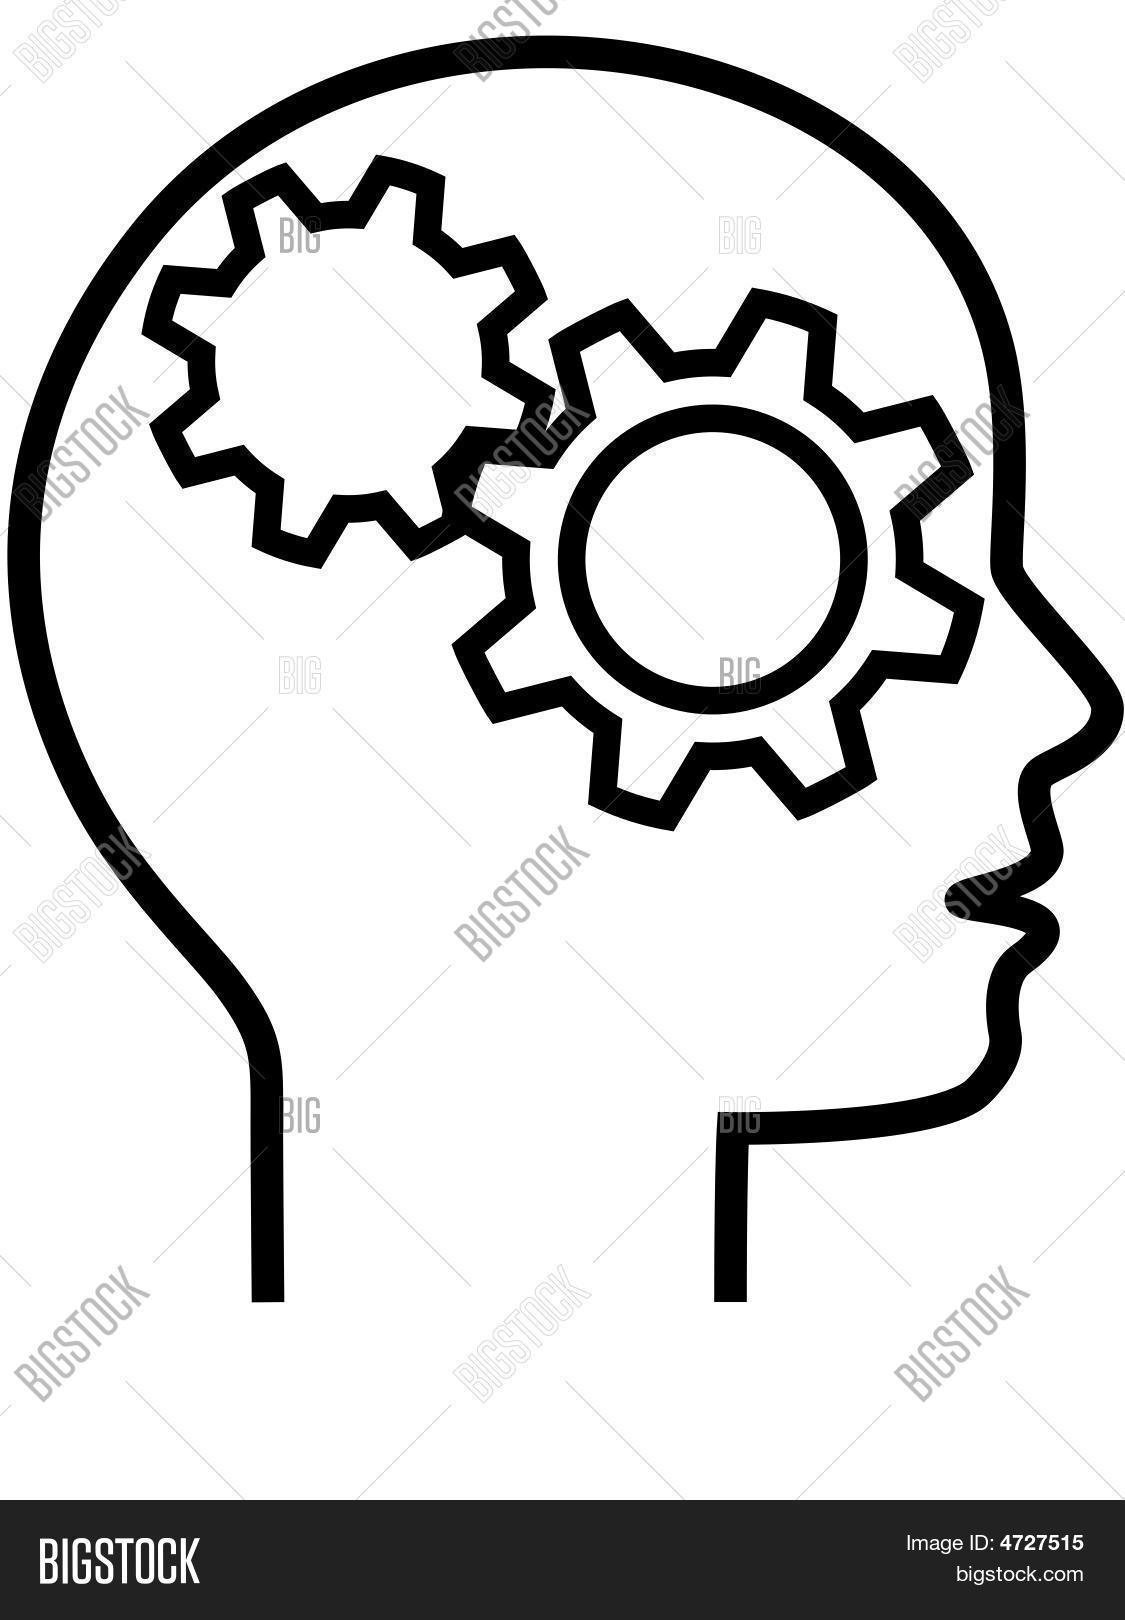 Profile Of Gear Head Brain Thinker Outline Stock Vector & Stock.